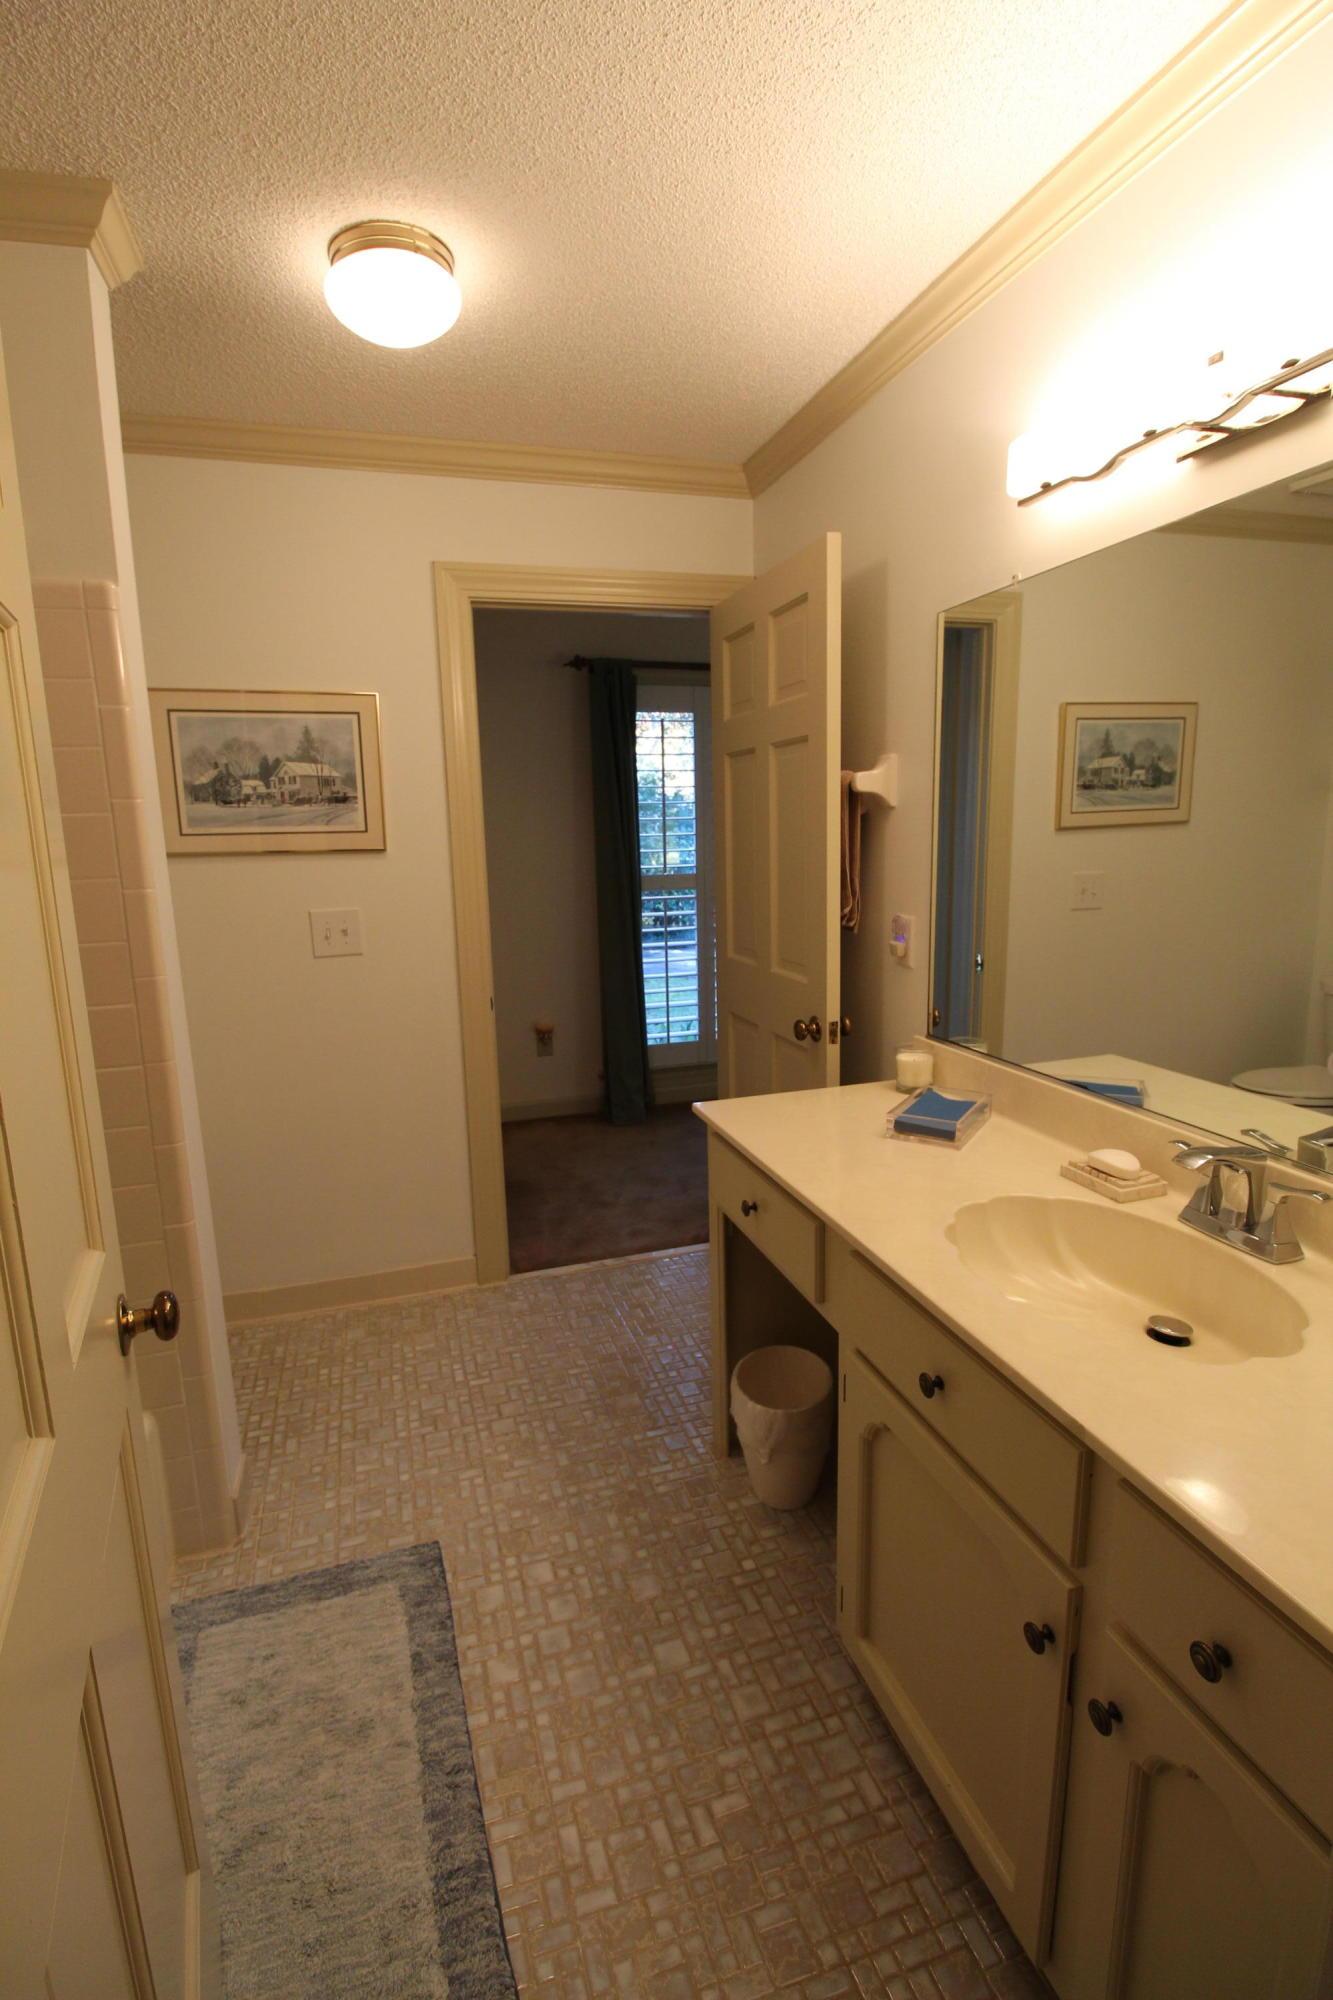 Lawton Bluff Homes For Sale - 735 Lawton Pl, Charleston, SC - 90